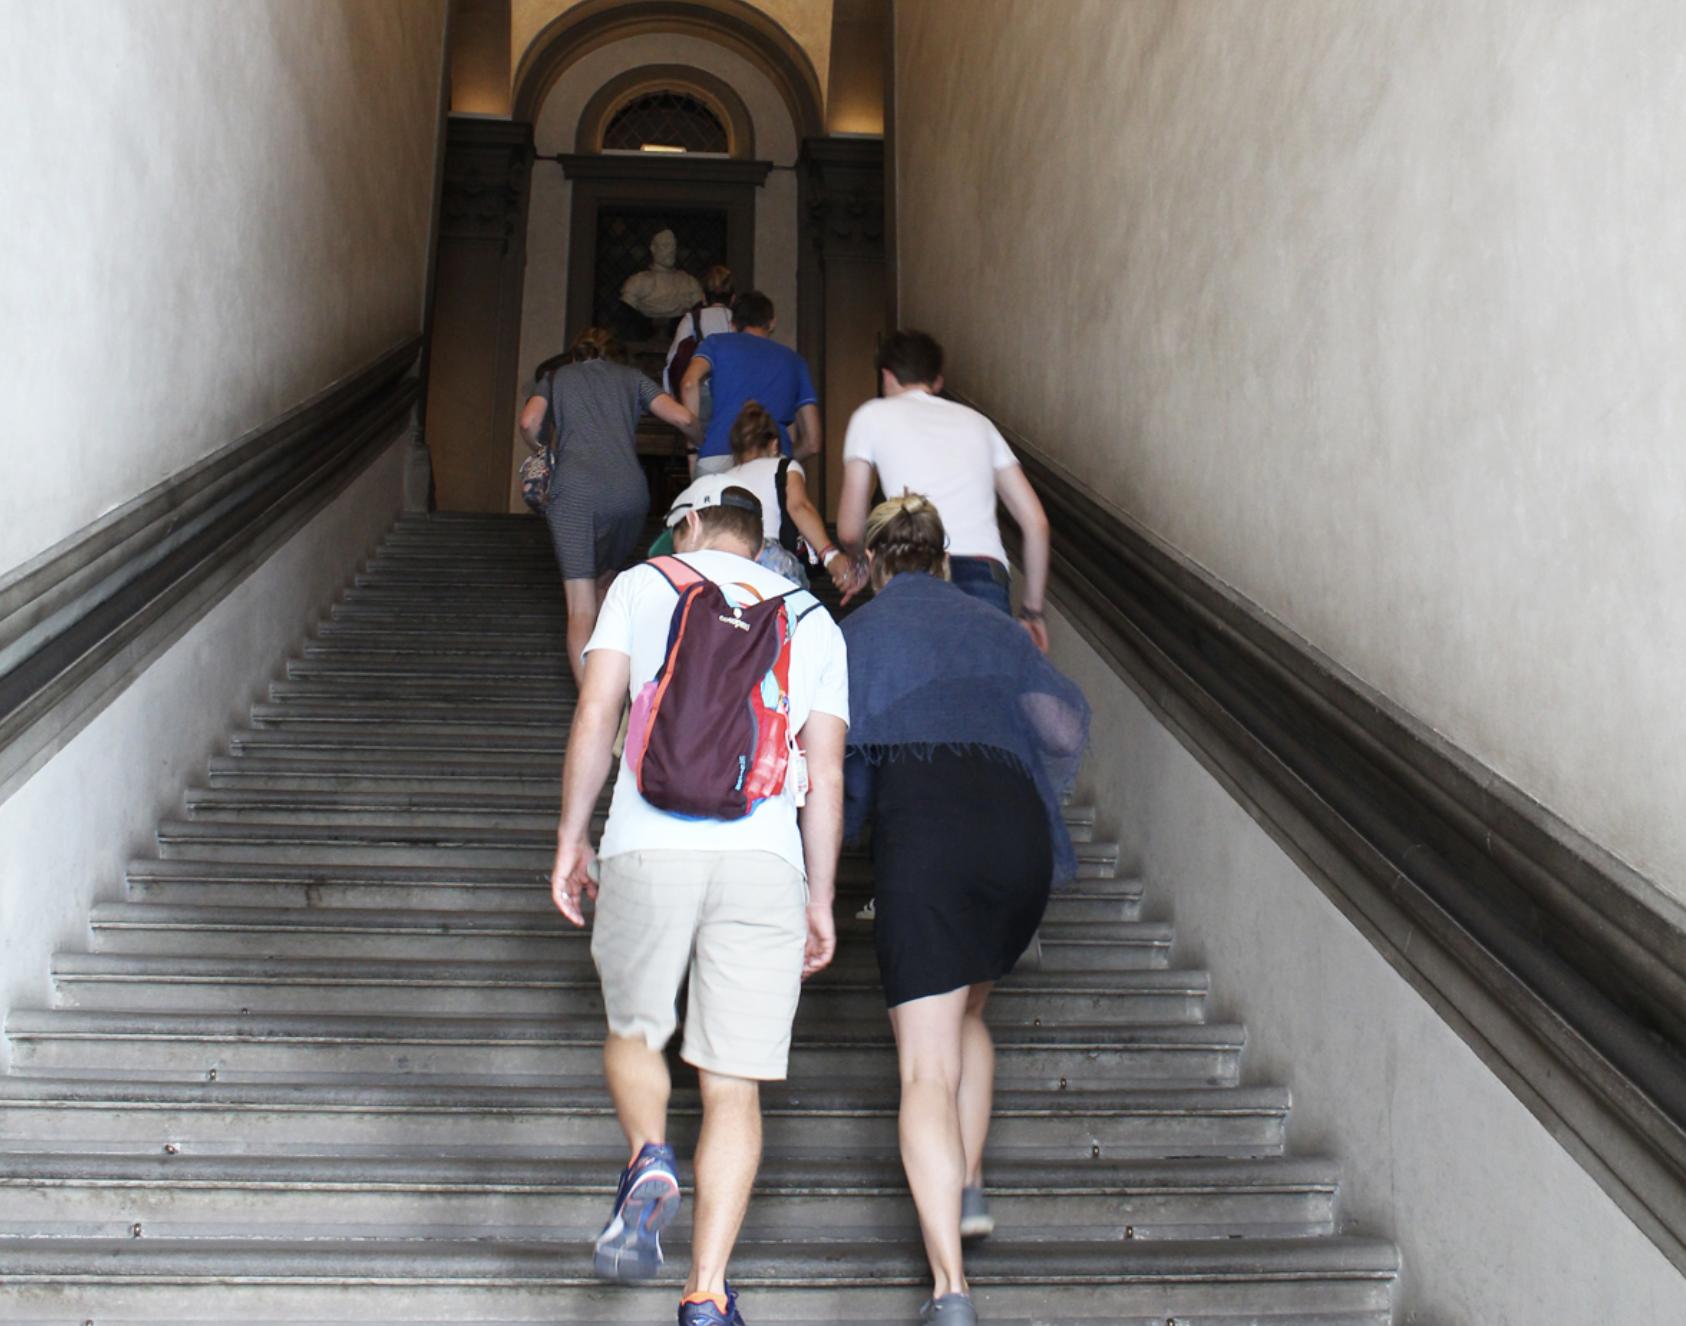 Uffizi Gallery — Entrance Staircase